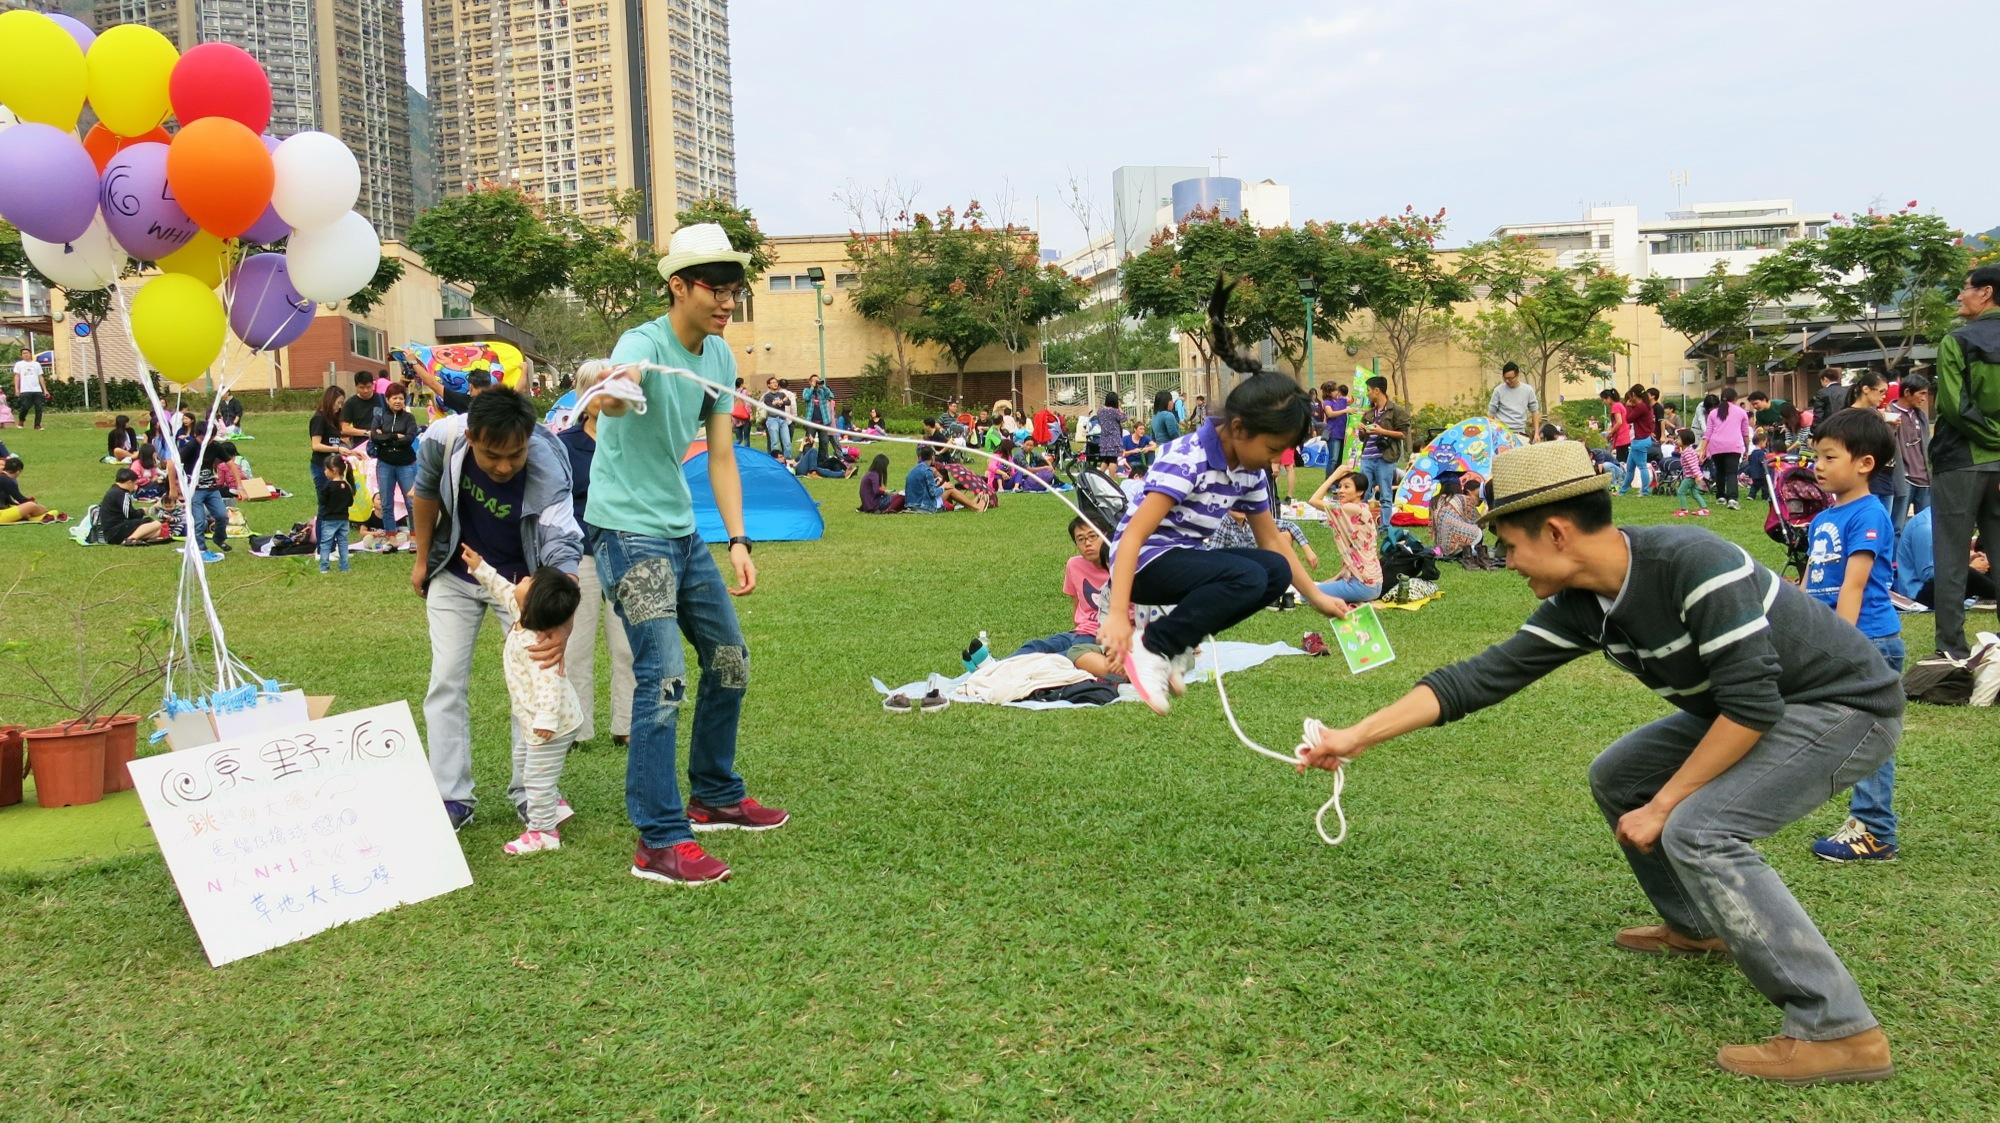 6.-原野派-Lawn-a-While